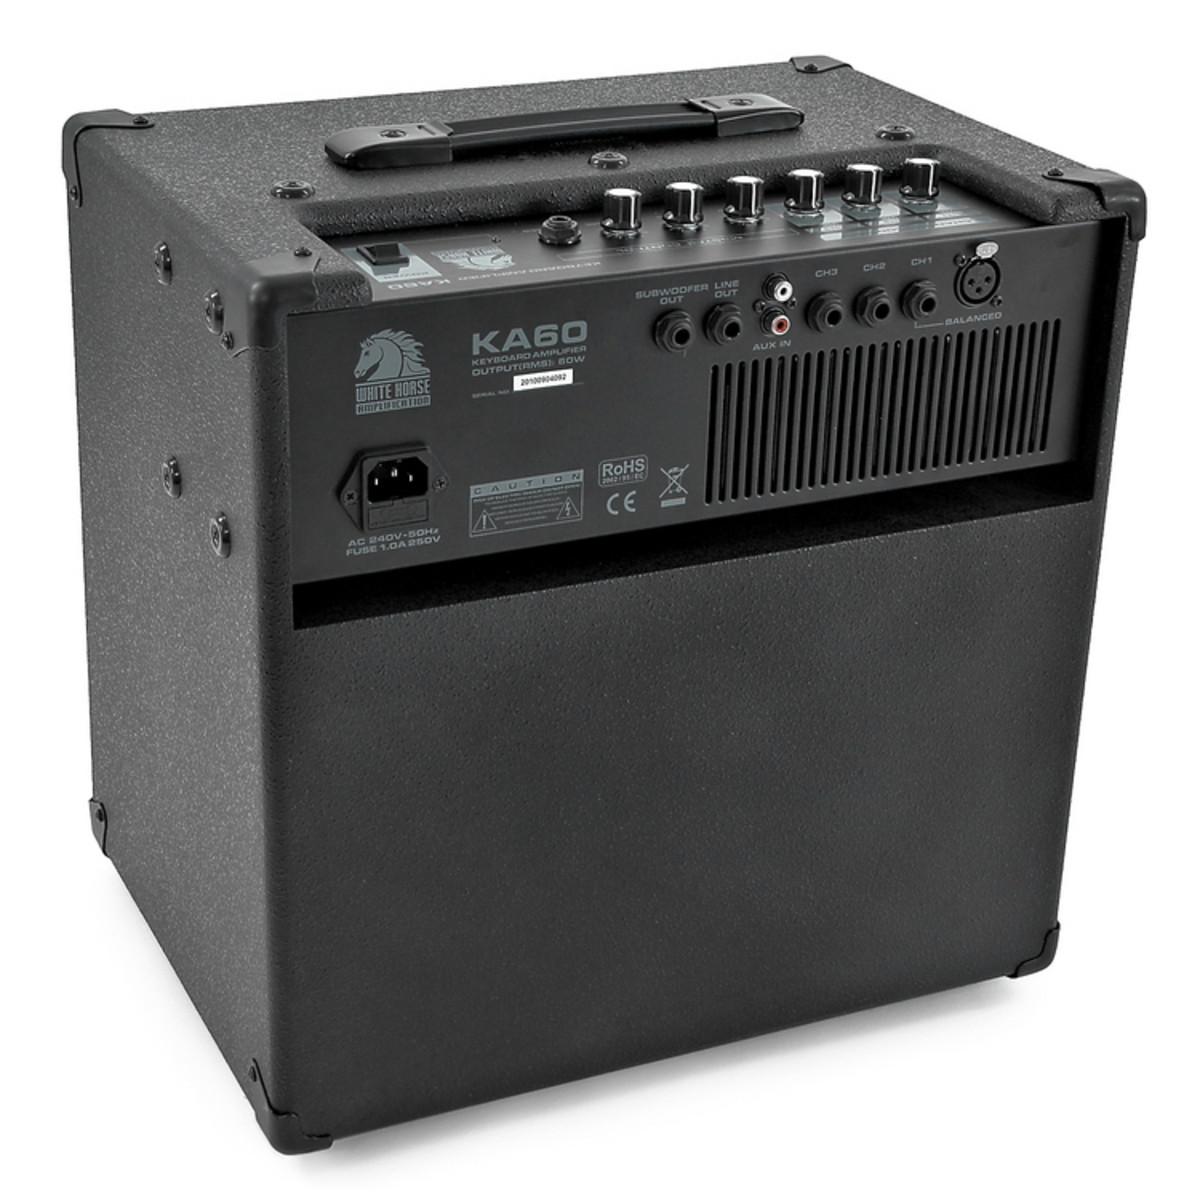 white horse ka 60 keyboard amp at gear4music. Black Bedroom Furniture Sets. Home Design Ideas